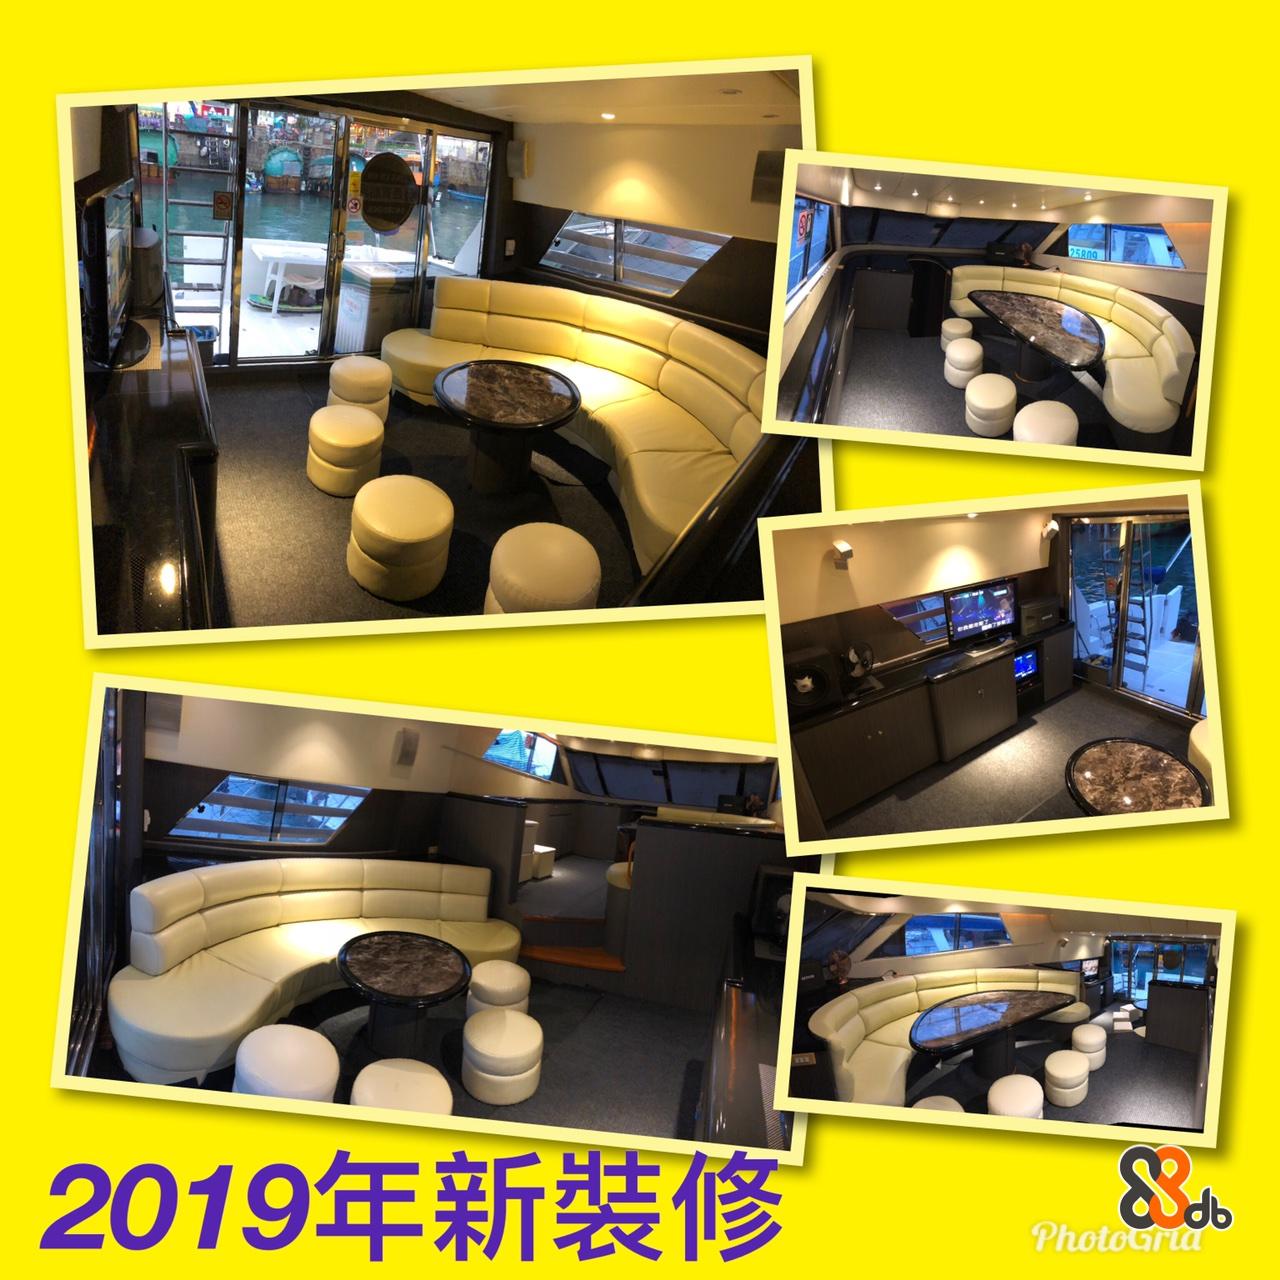 Pho 2019年新装修  Yellow